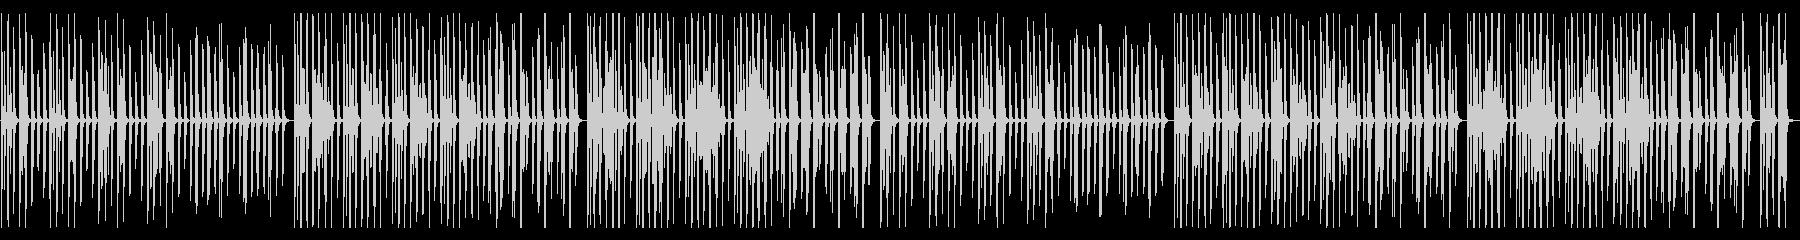 YouTube ピアノ・気だるいの未再生の波形